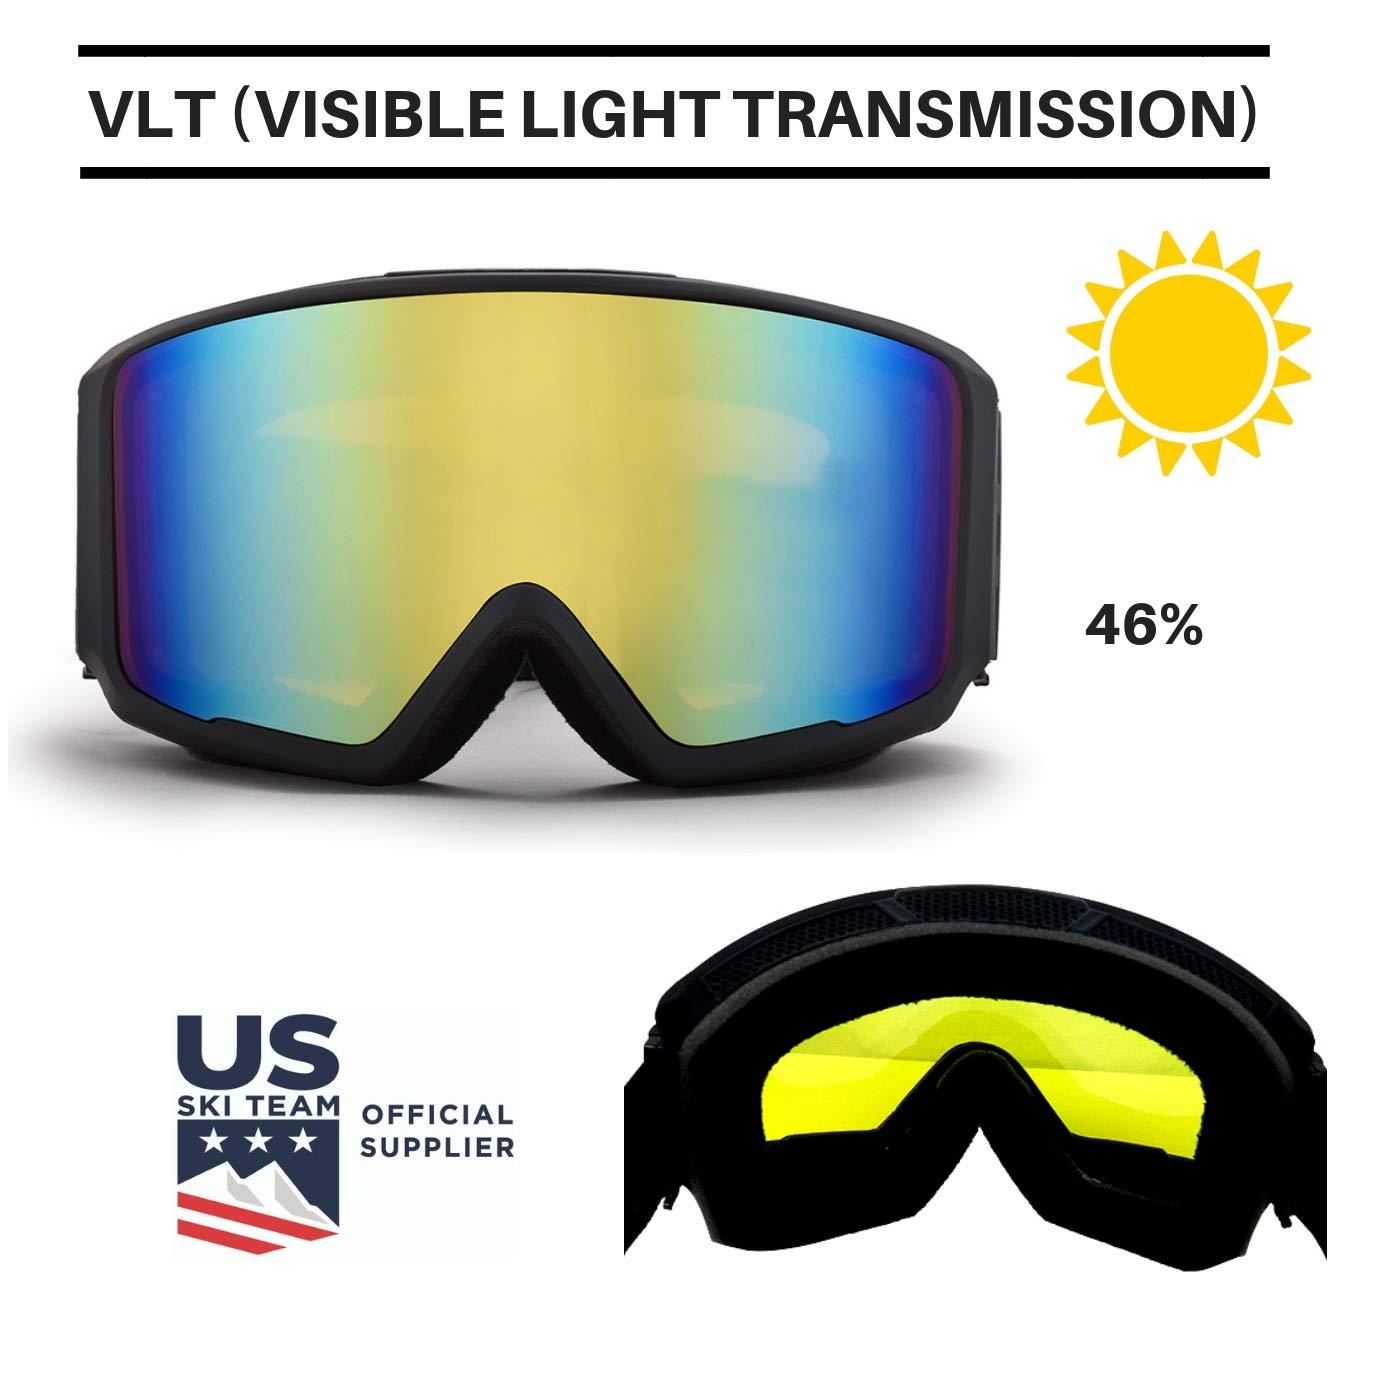 3f4b8ee1c5a9 Amazon.com   Zipline Ski Snowboard Snowmobile Goggles Podium CL No Fog  Interchangeable Magnetic Hybrid Lens System - US Ski Team Official Goggle  (Yellow ...